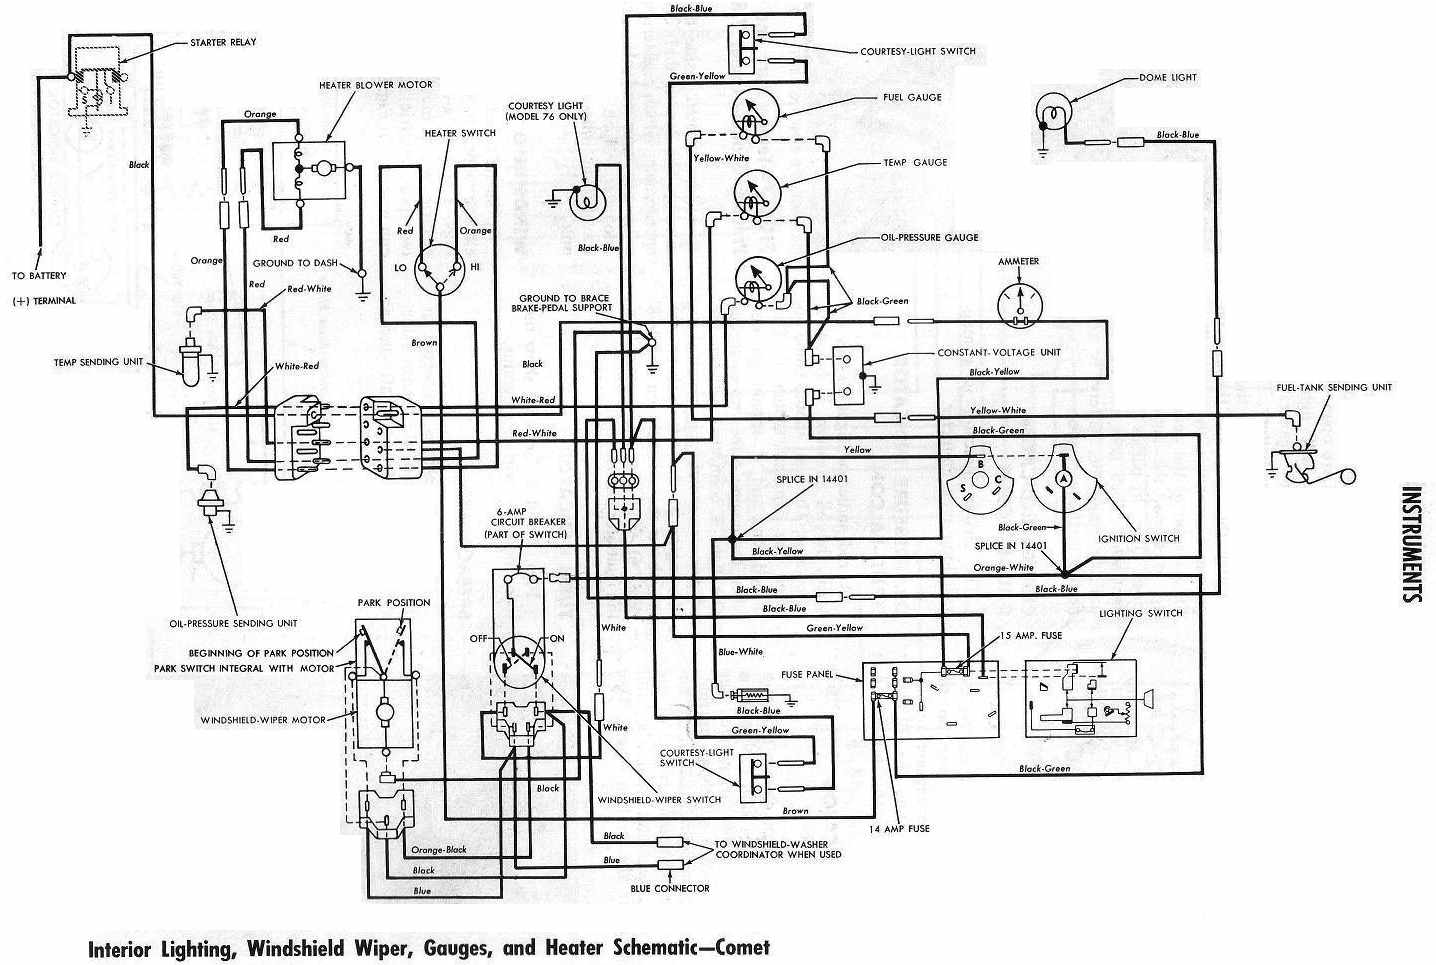 65 comet wiring diagram   23 wiring diagram images